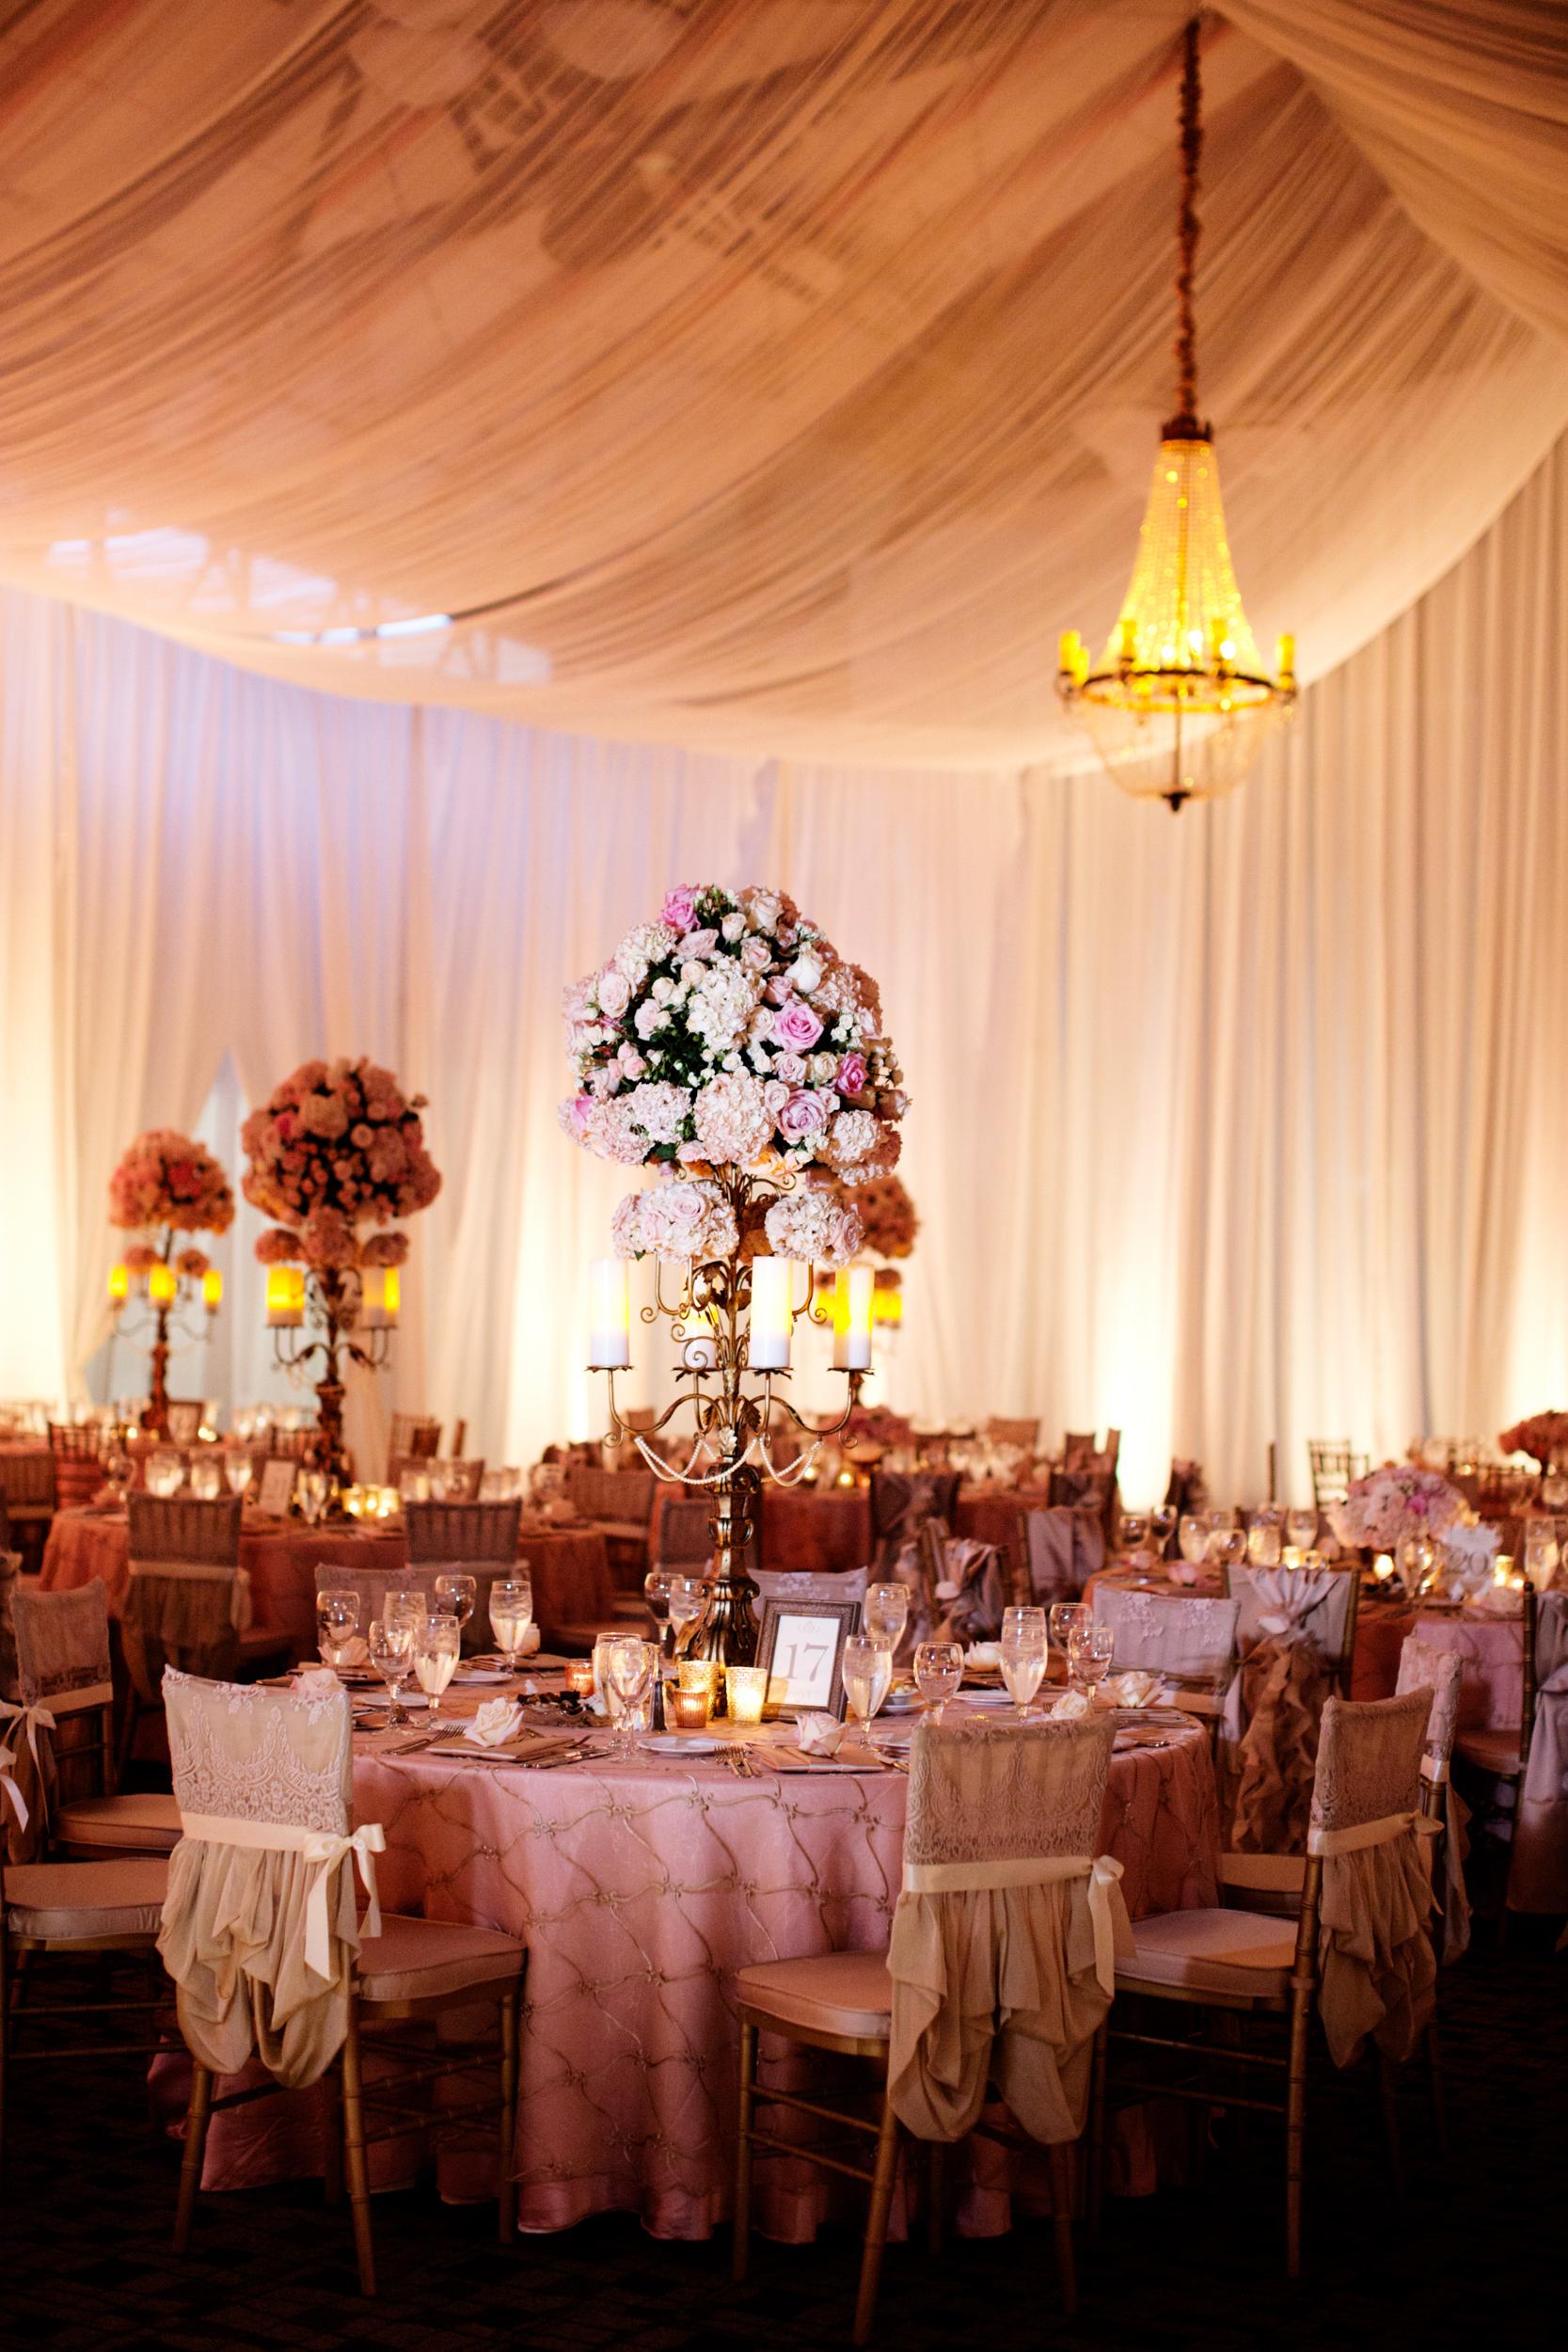 Ceci_New_York_Ceci_Style_Ceci_Johnson_Luxury_Lifestyle_Floral_Lace_Wedding_Letterpress_Inspiration_Design_Custom_Couture_Personalized_Invitations_-18.jpg